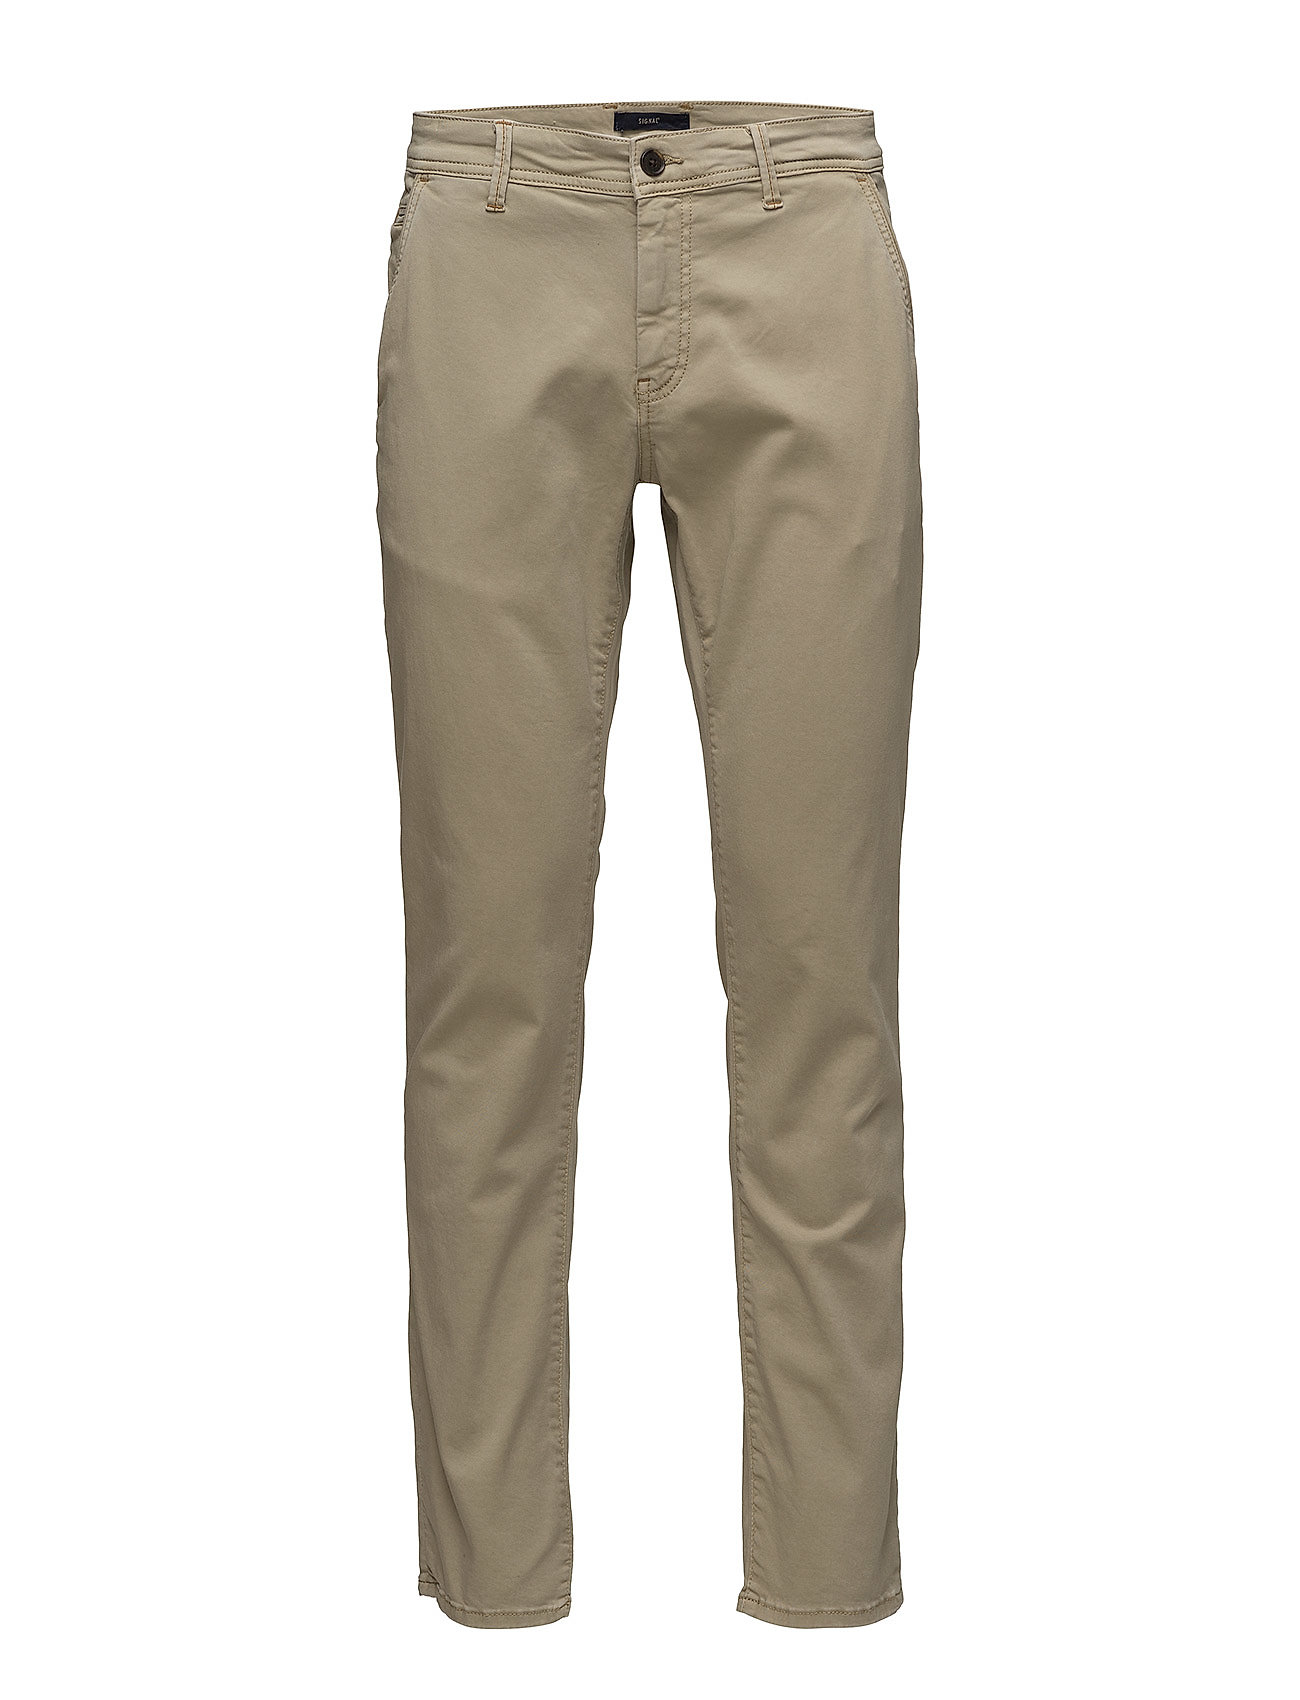 Signal Pants - BROWN SUGAR